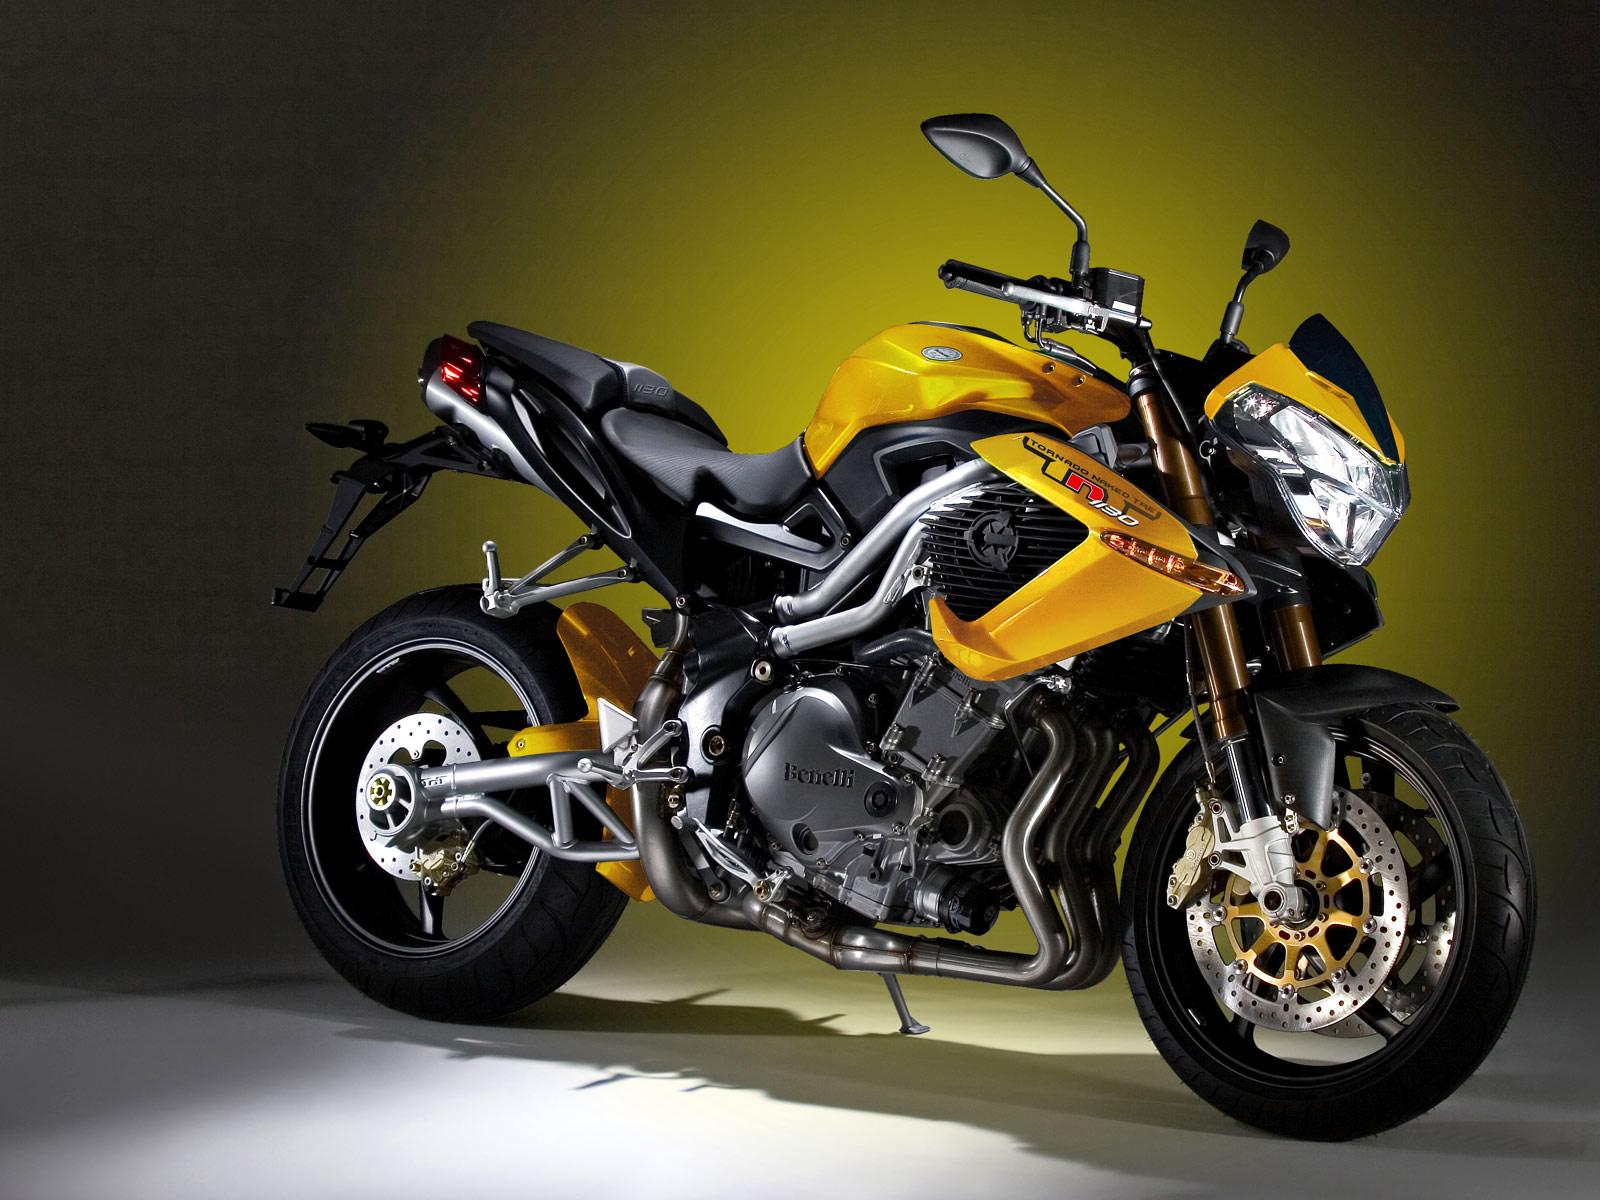 http://1.bp.blogspot.com/-7cSbQEZCWuU/Tr2wFJ0q0OI/AAAAAAAADrI/Q6LcDhK3dkg/s1600/2006_benelli_tnt_tornado_naked_tre_motorcycle-desktop-wallpaper_1.jpg